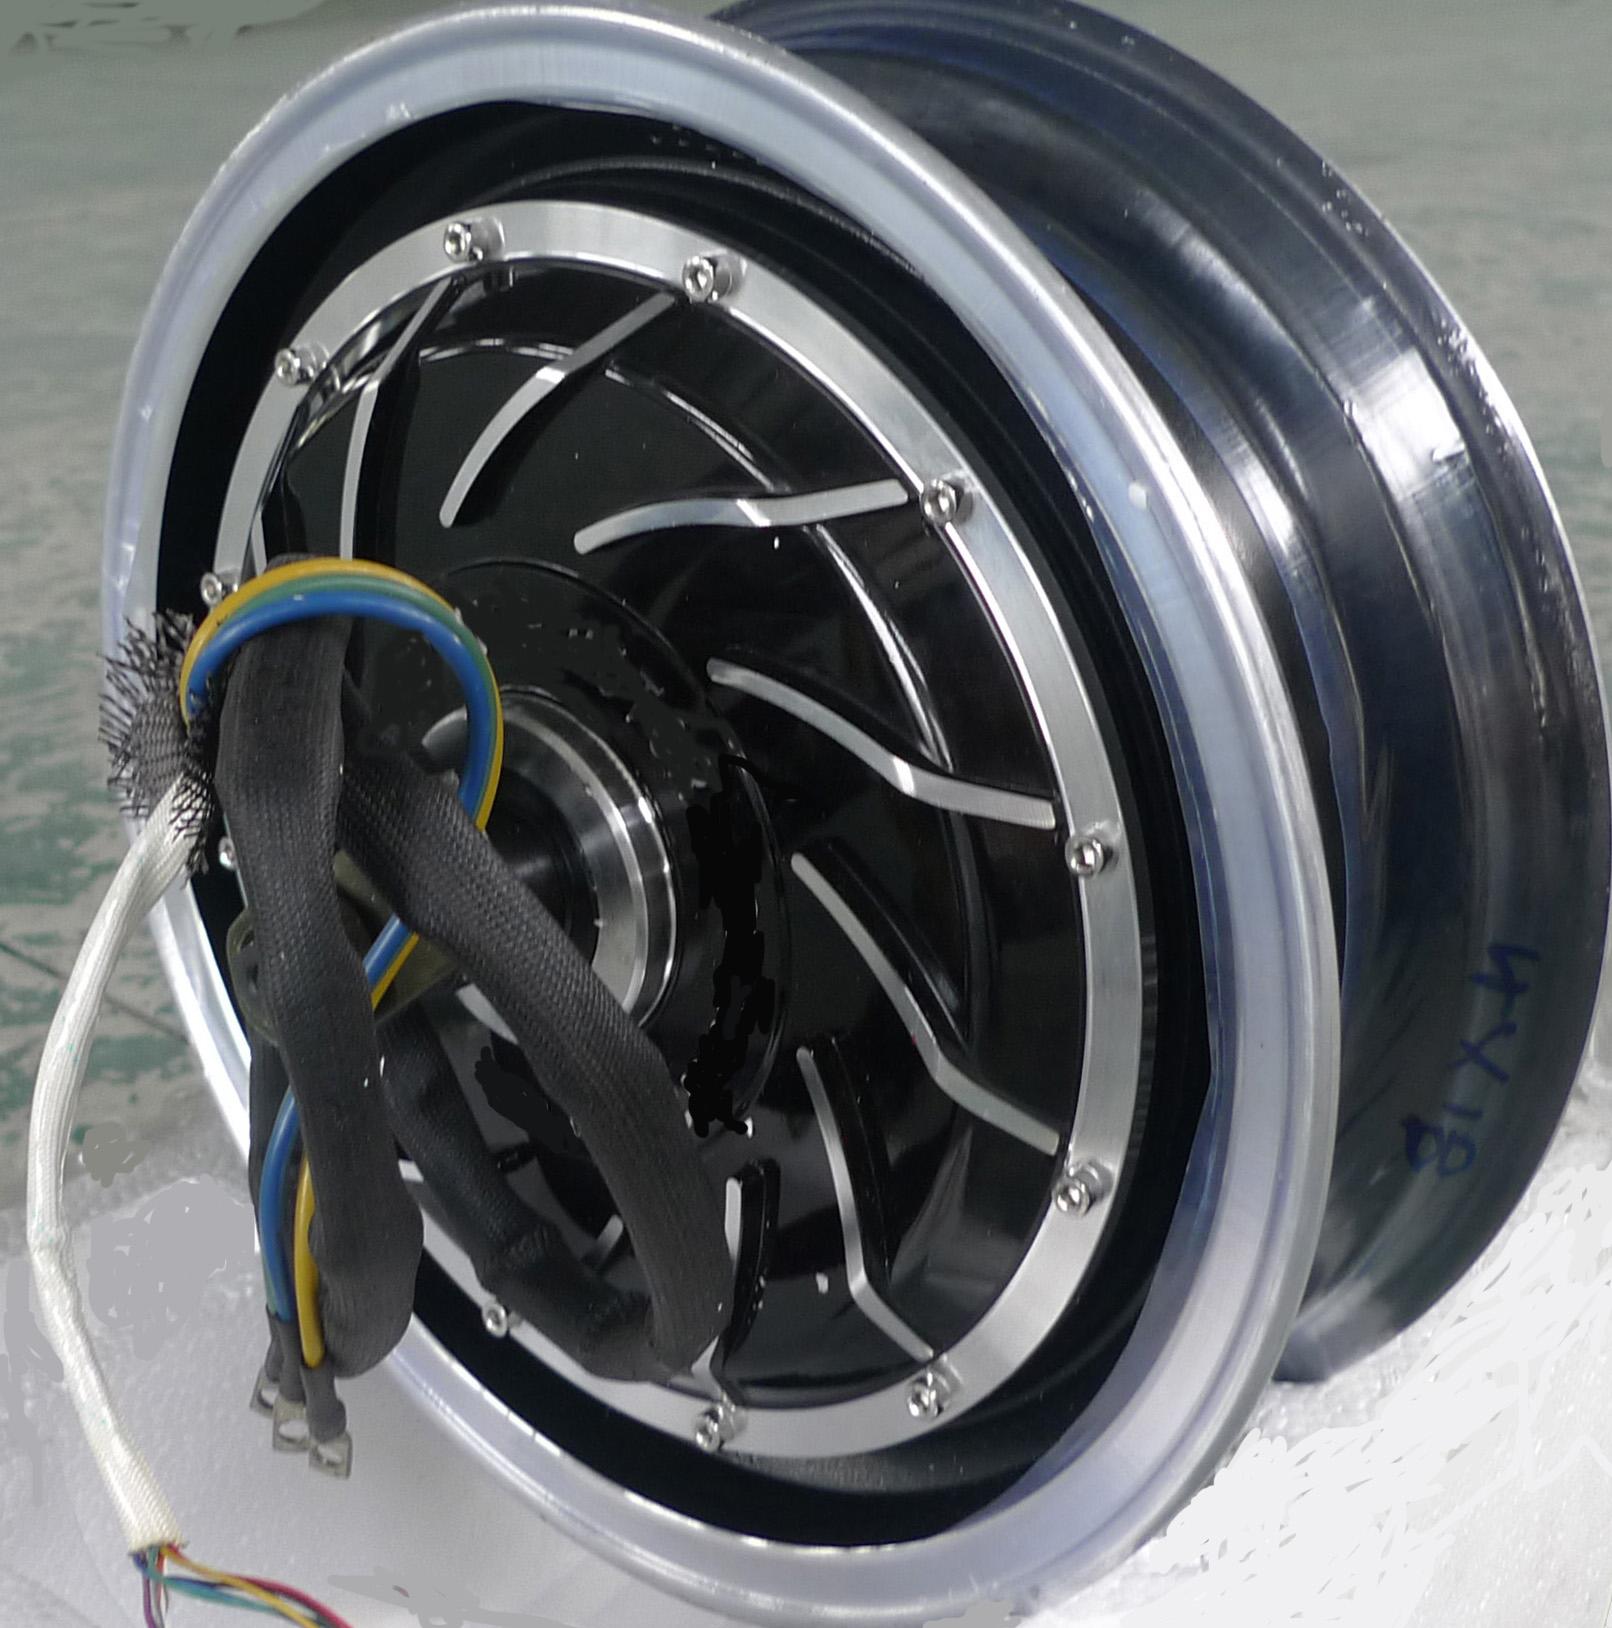 Berkas zev 10 kw electric hub wikipedia bahasa for 10 kw dc motor